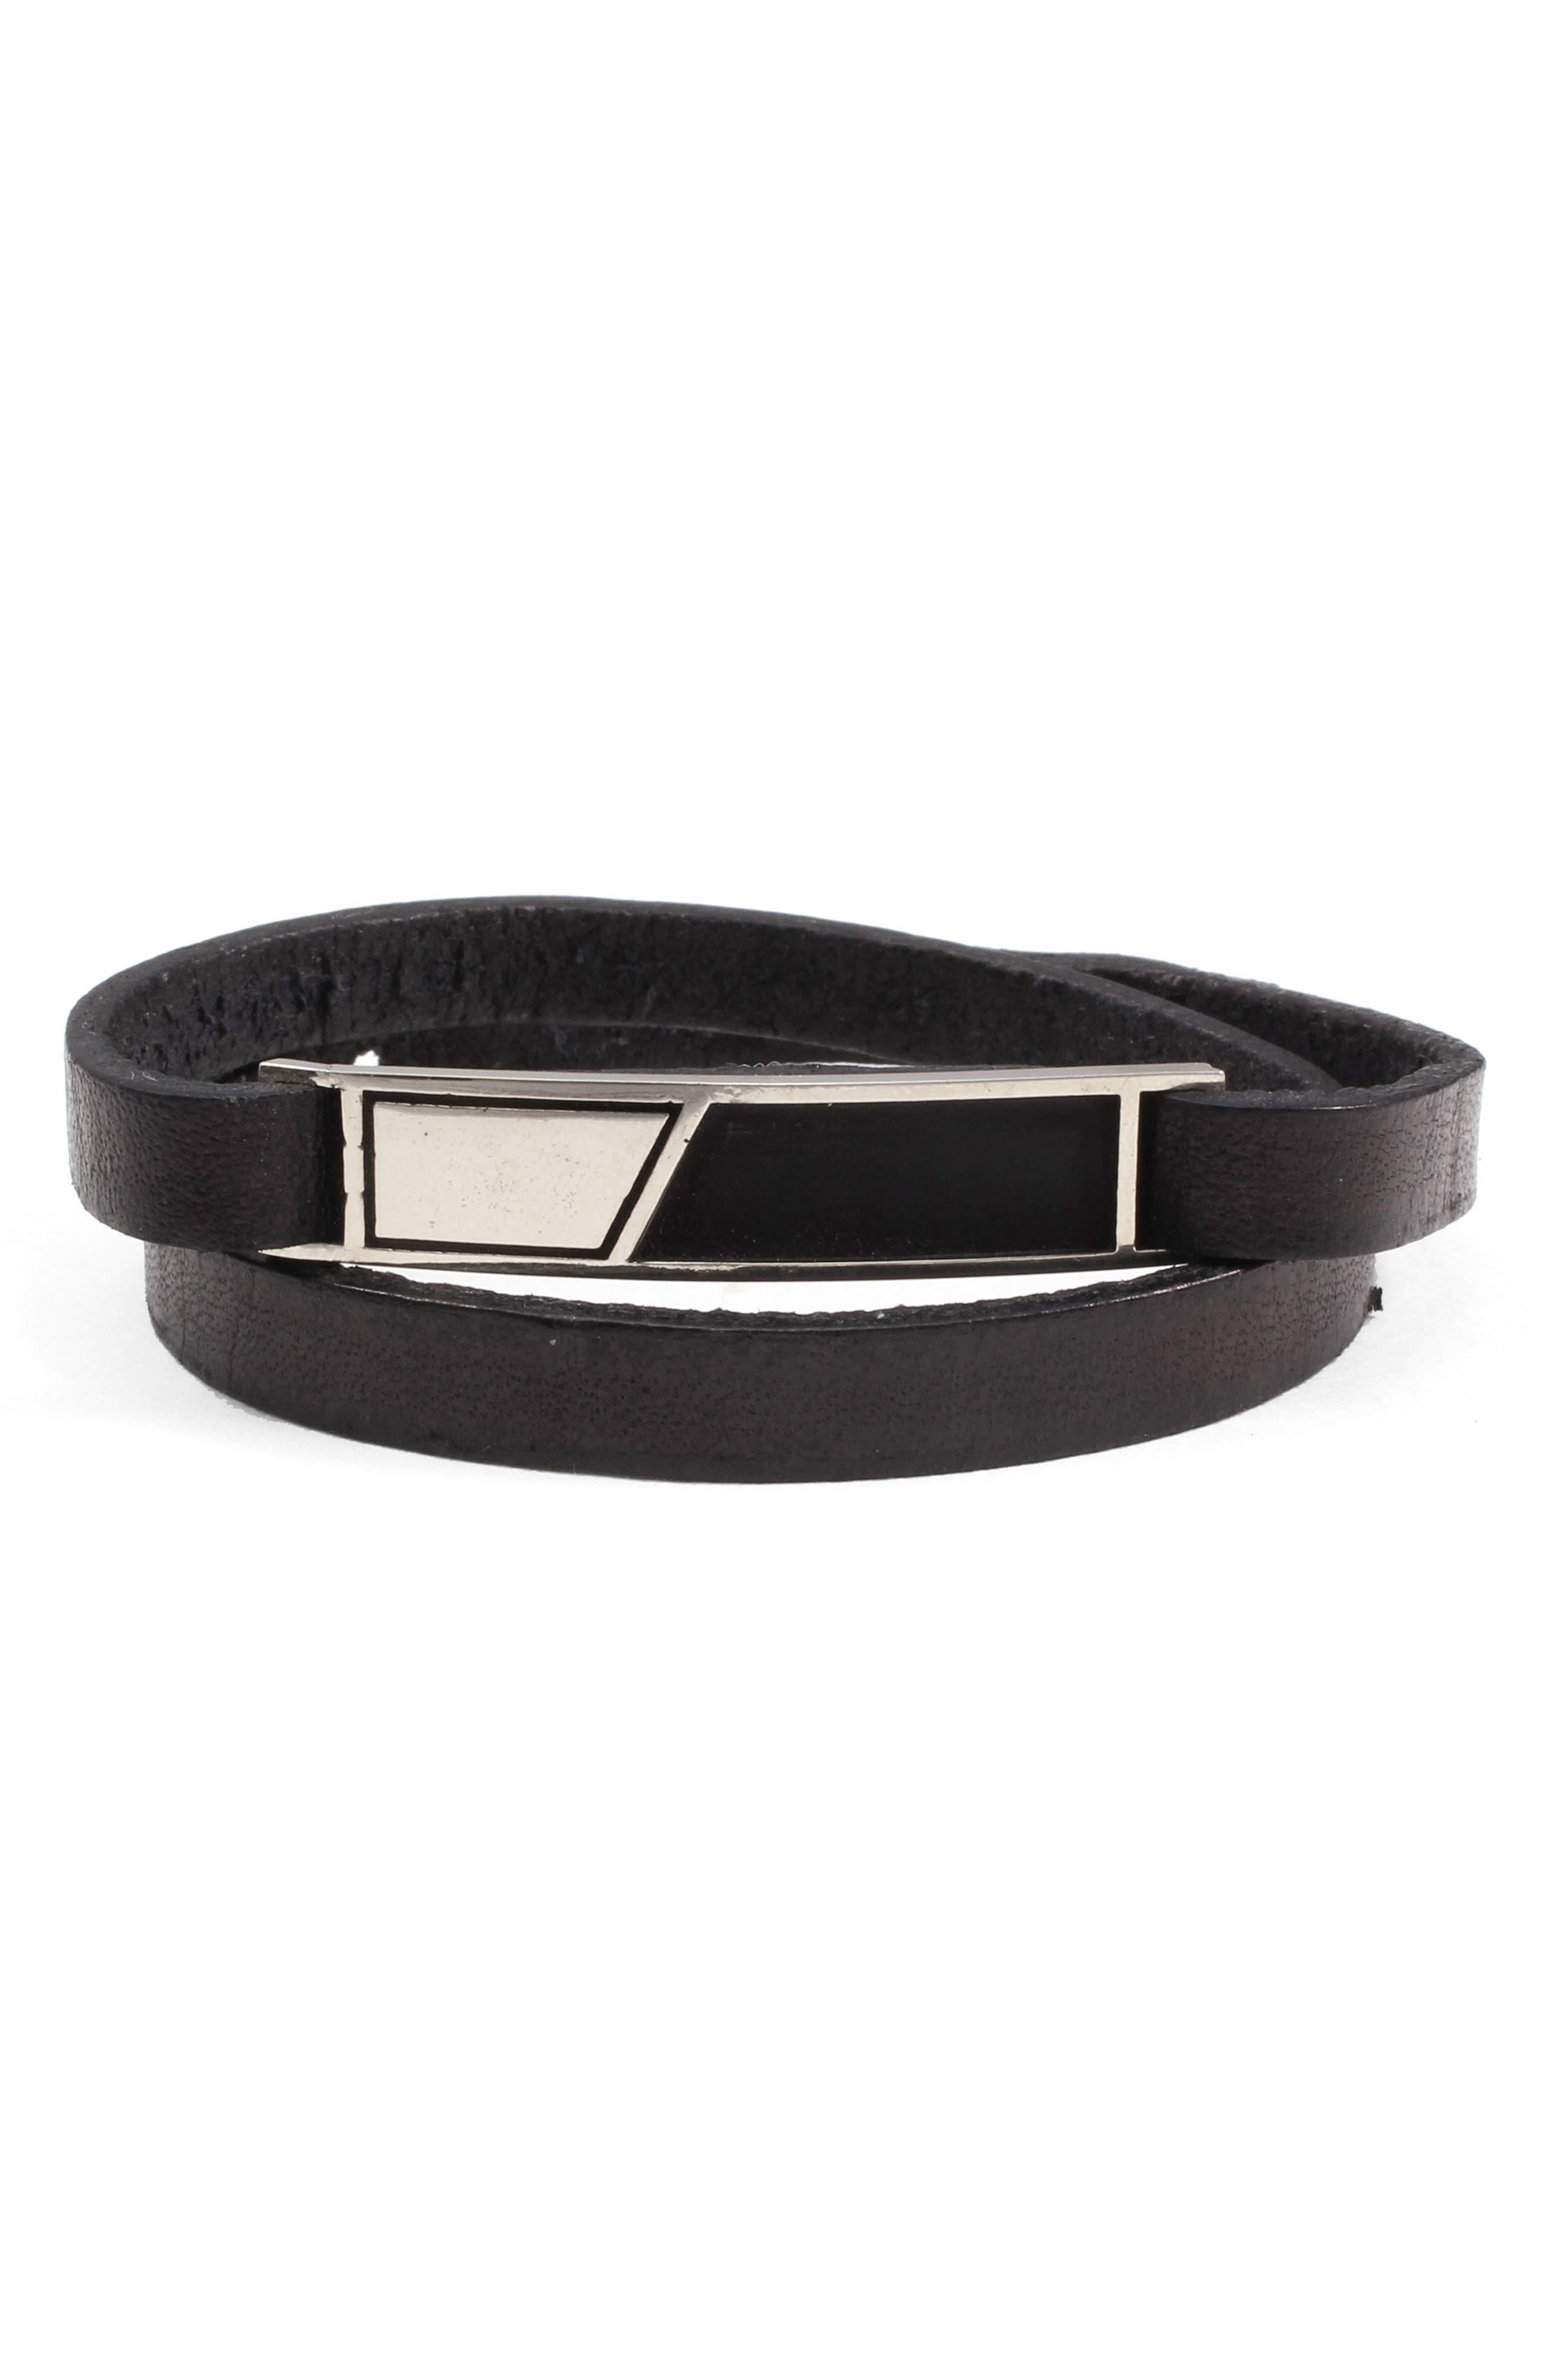 Dystopia ID Leather Wrap Bracelet,                             Main thumbnail 1, color,                             001